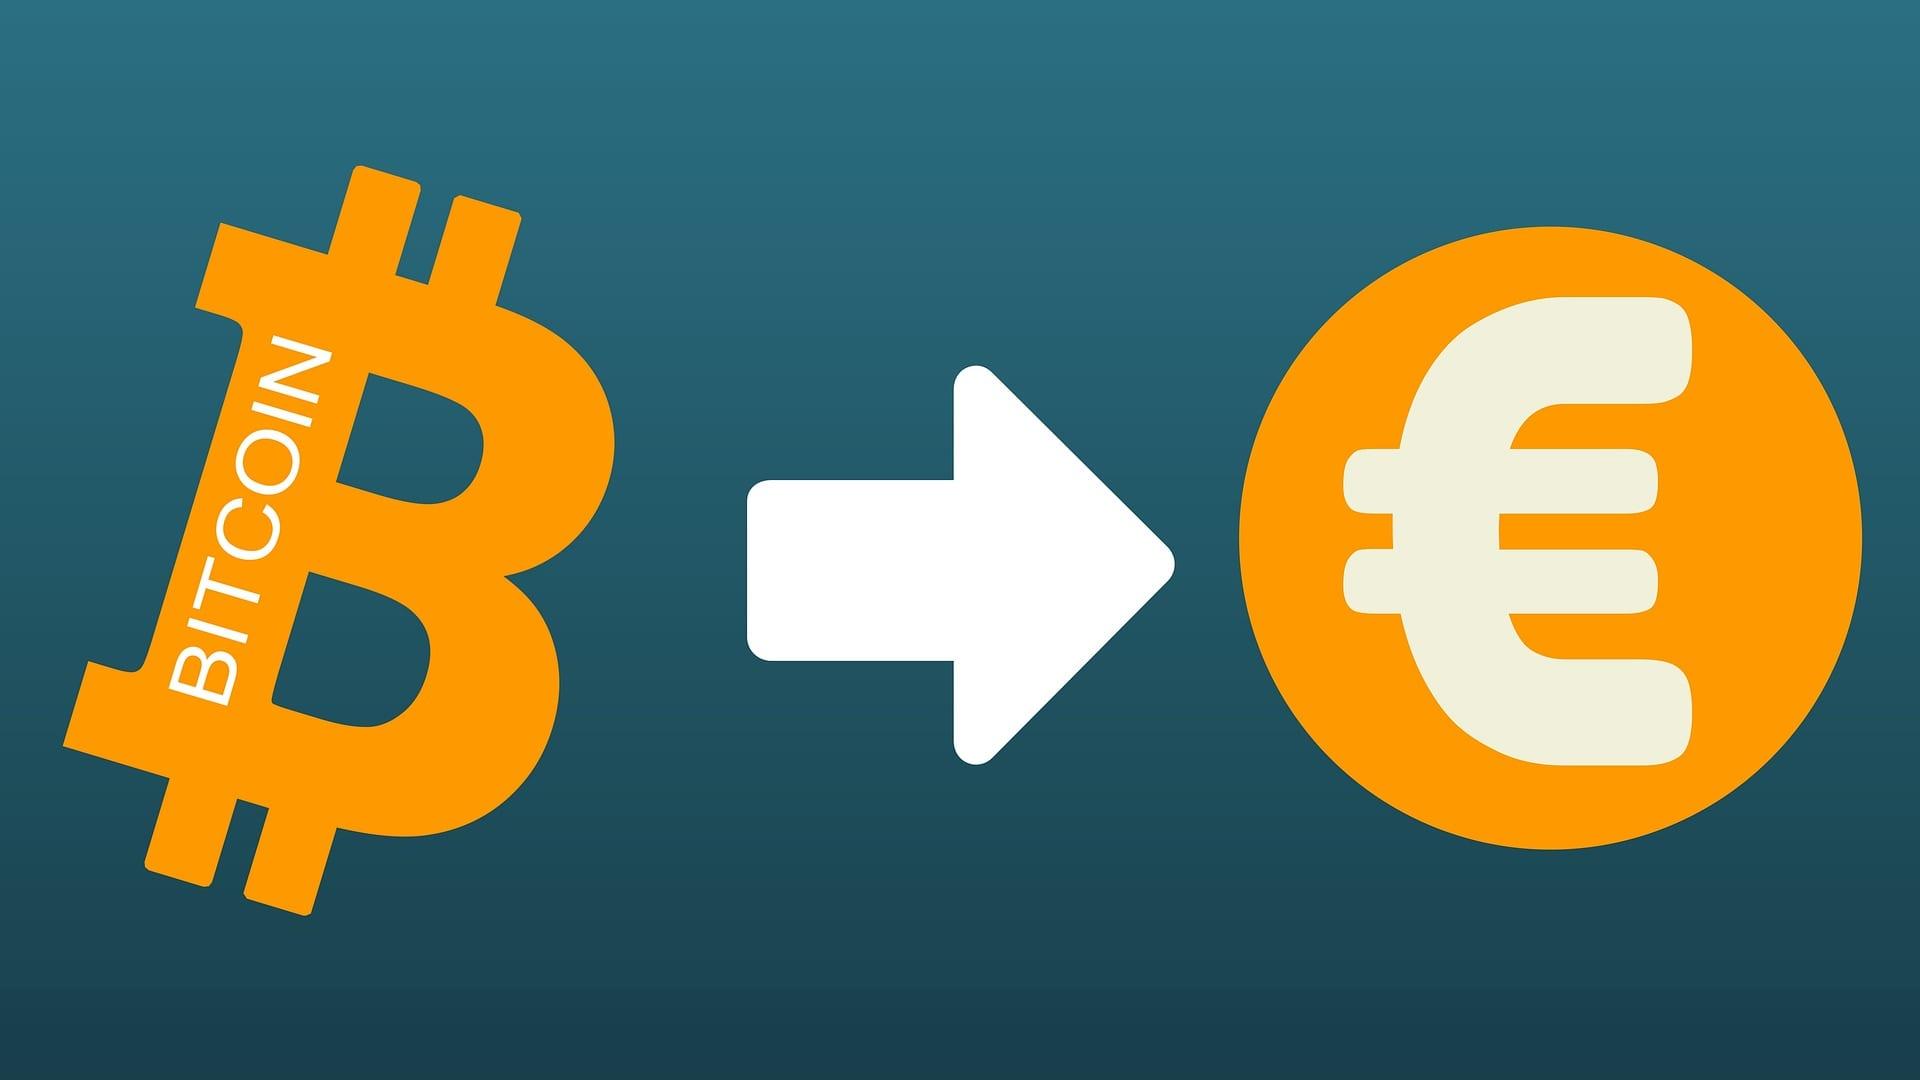 Bitcoin Koers Euro (BTC-EUR) koers informatie